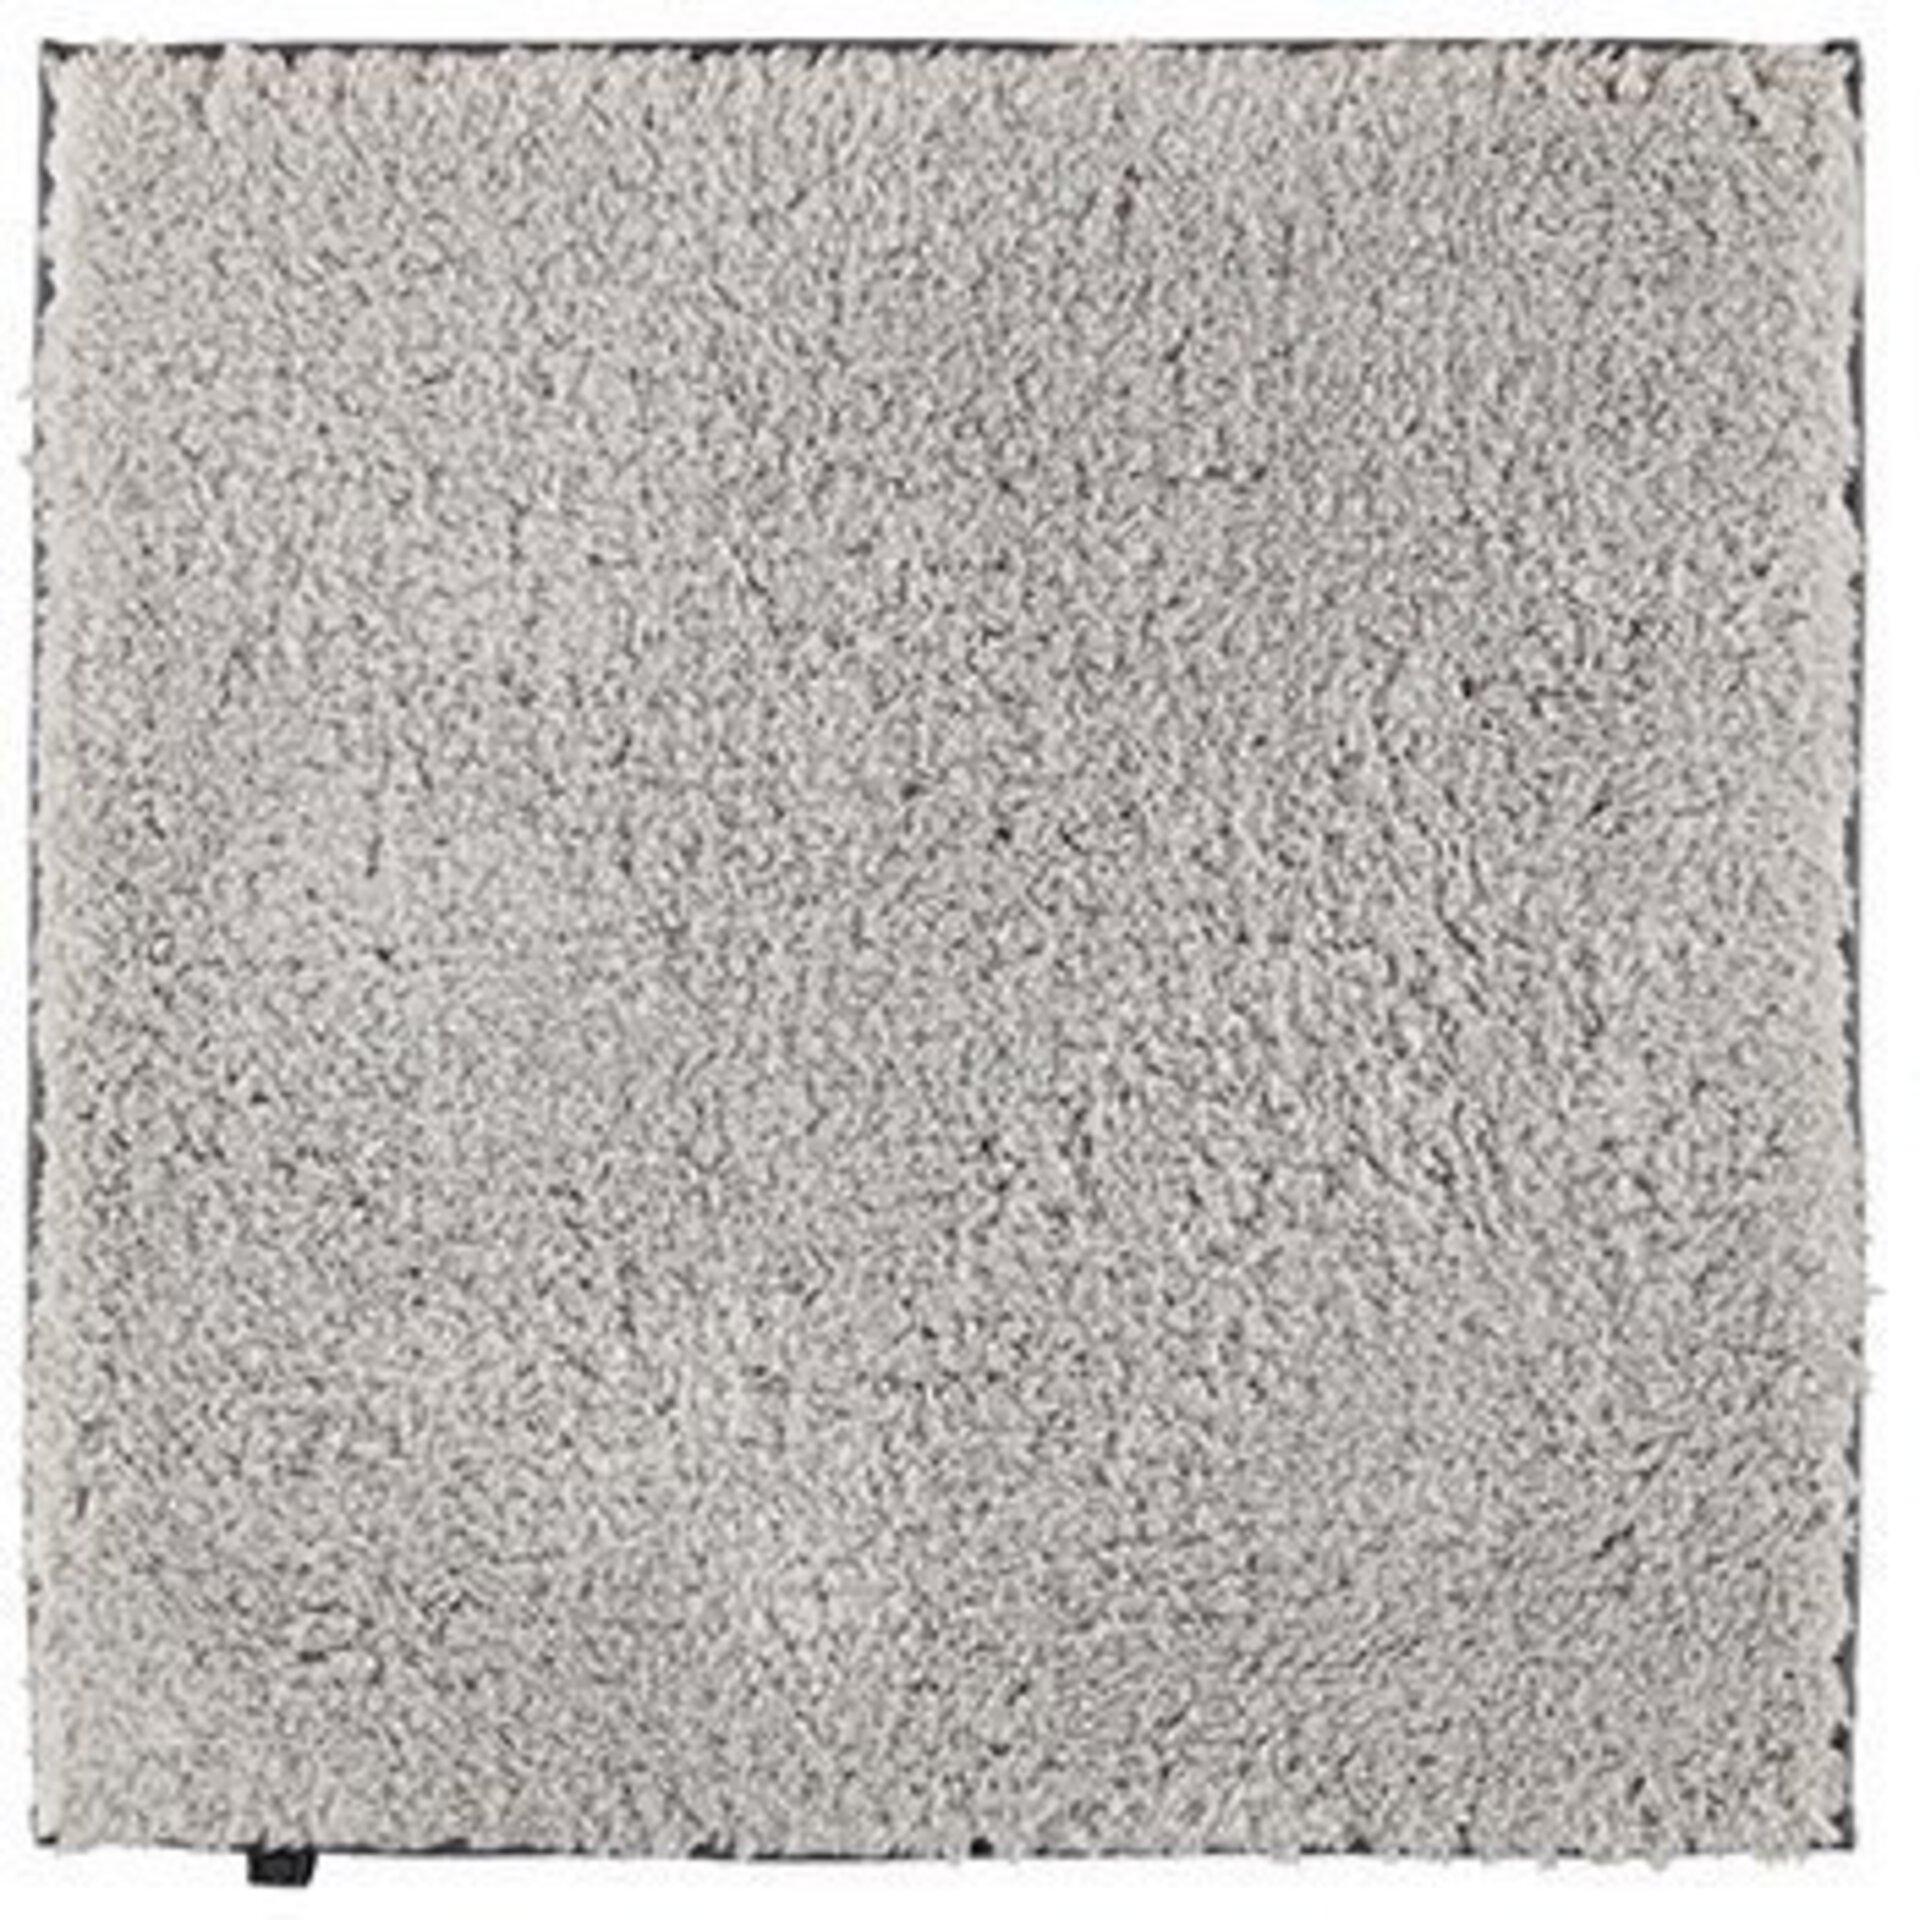 Badteppich Cawö Textil grau